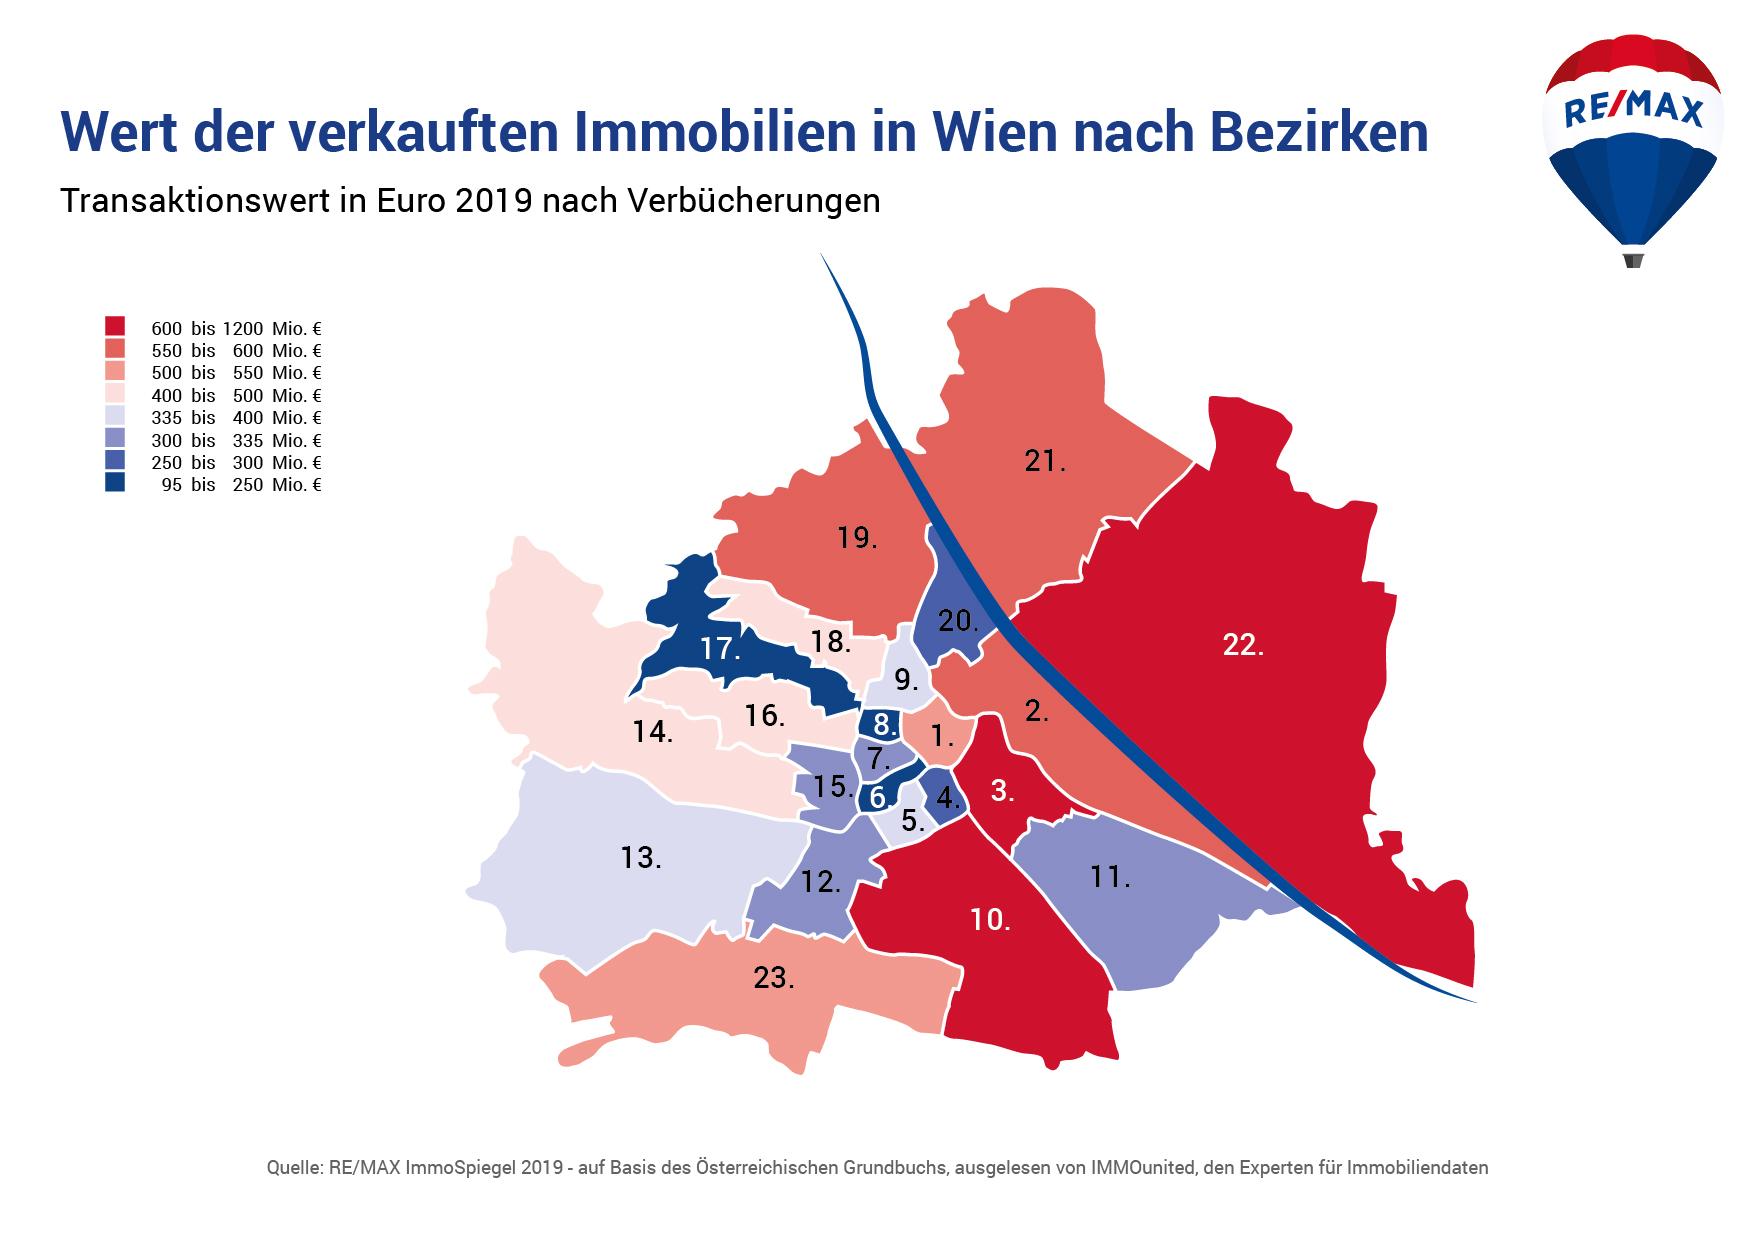 Wert der verkauften Immobilien in Wien nach Bezirken